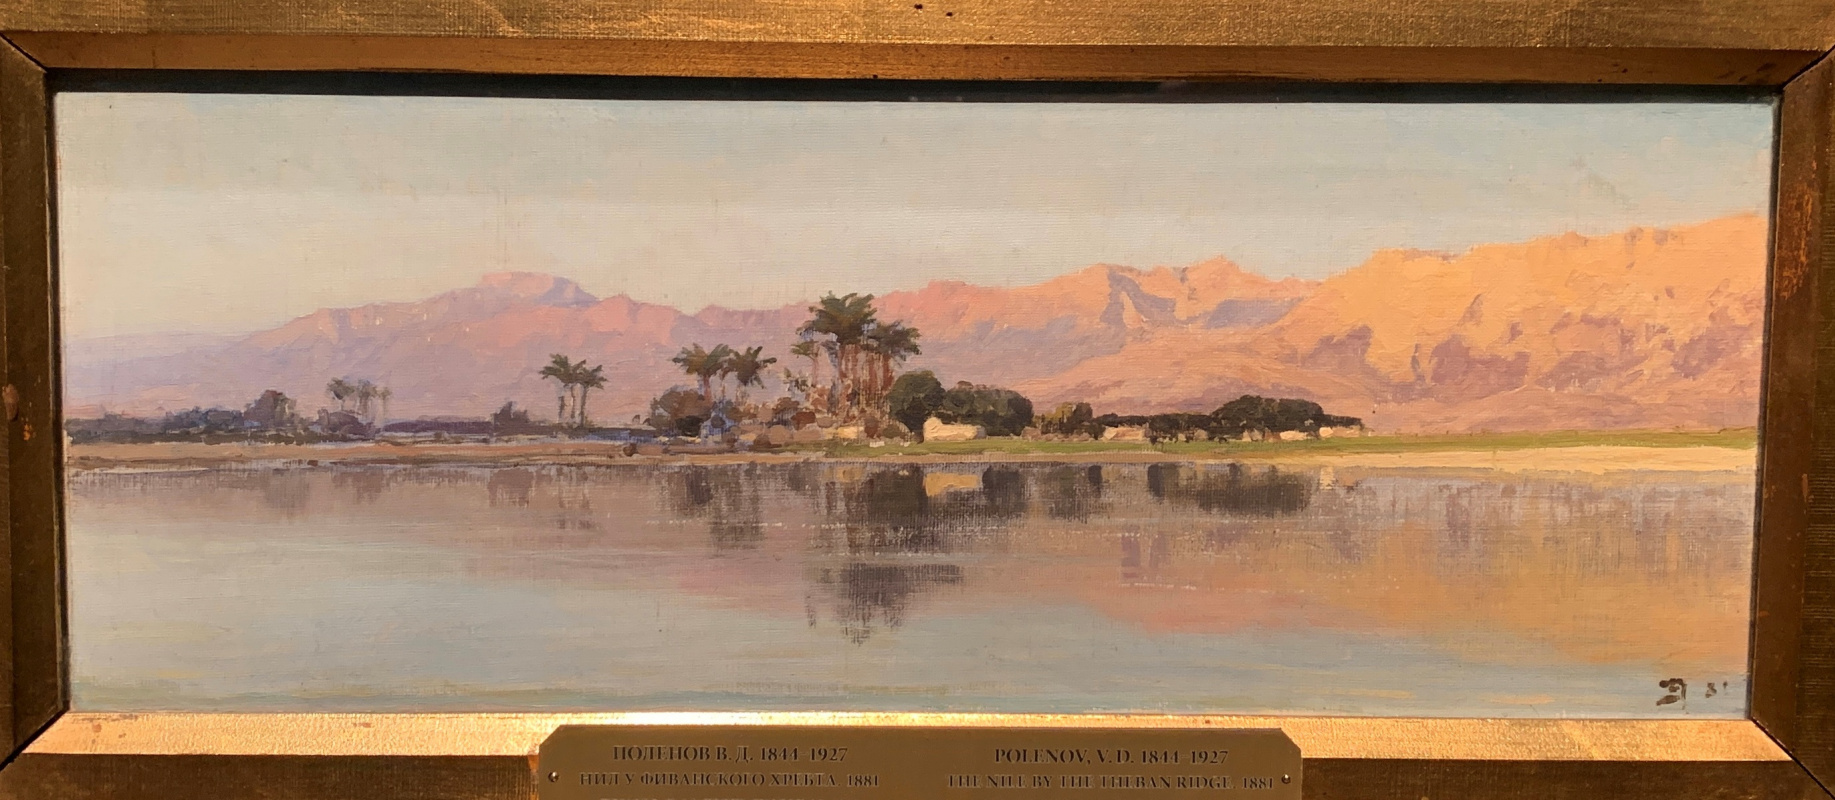 Vasily Dmitrievich Polenov. Nile at the Theban Range